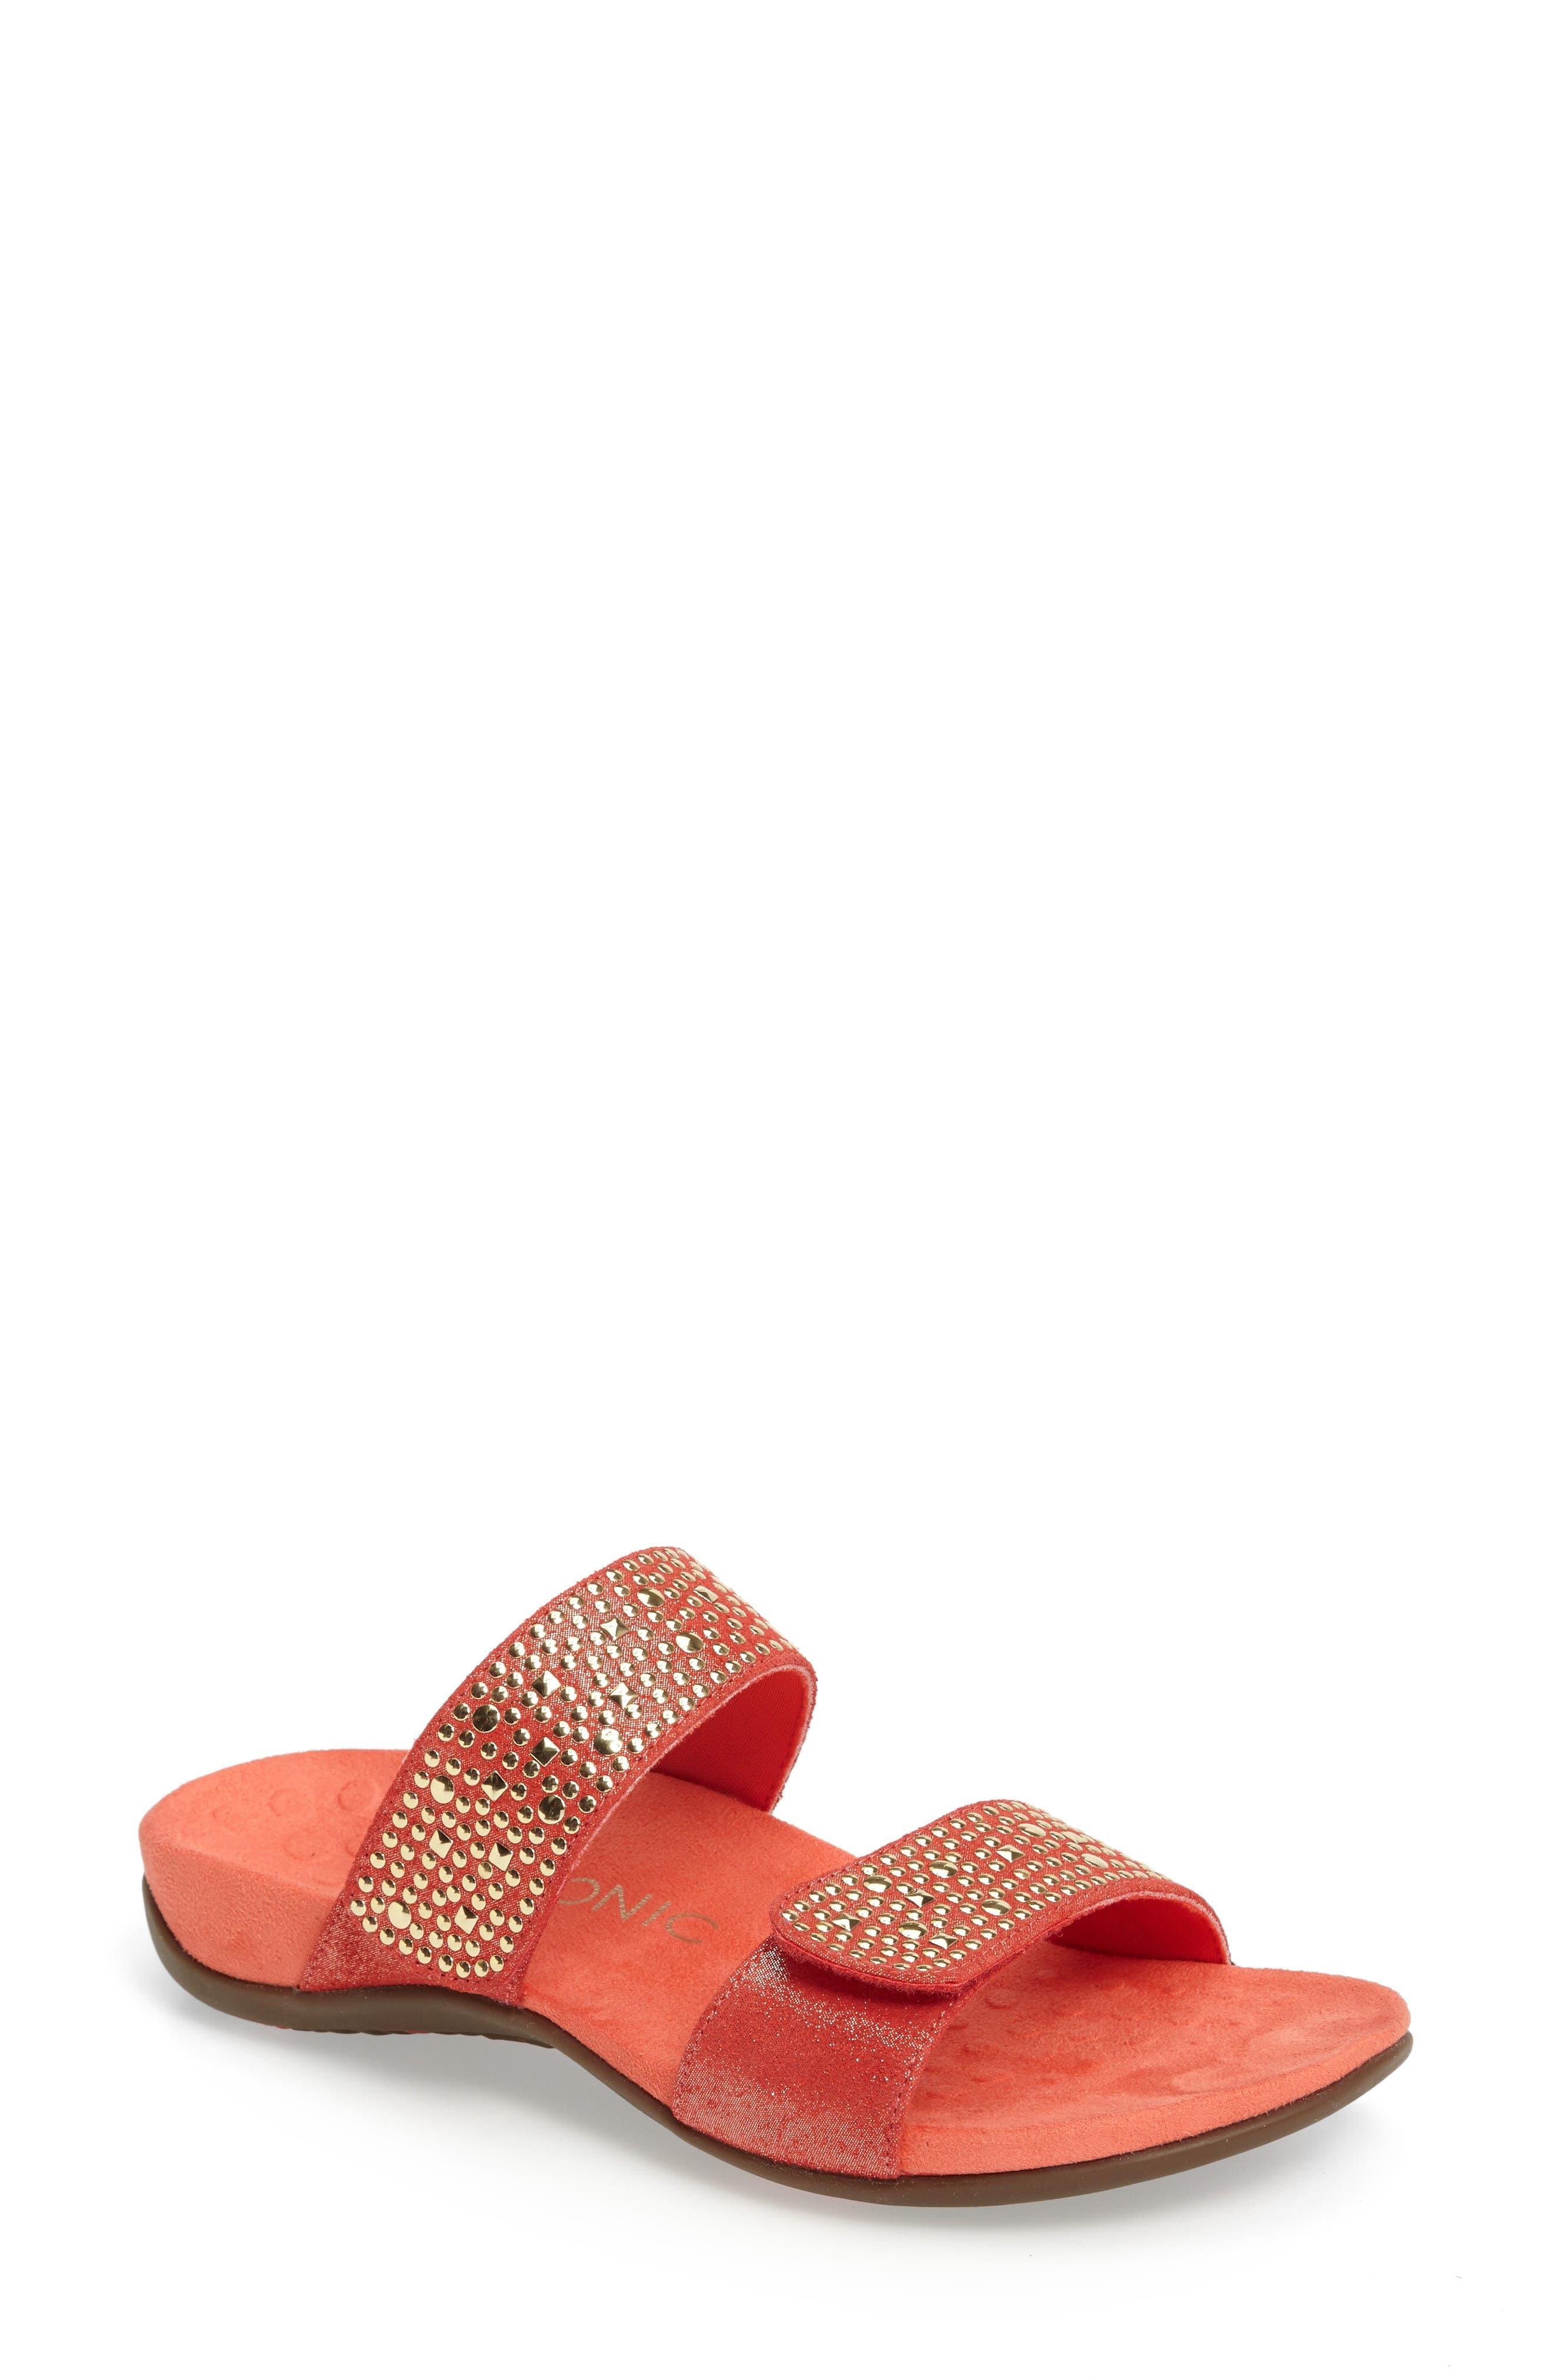 Main Image - Vionic 'Samoa' Sandal (Women)